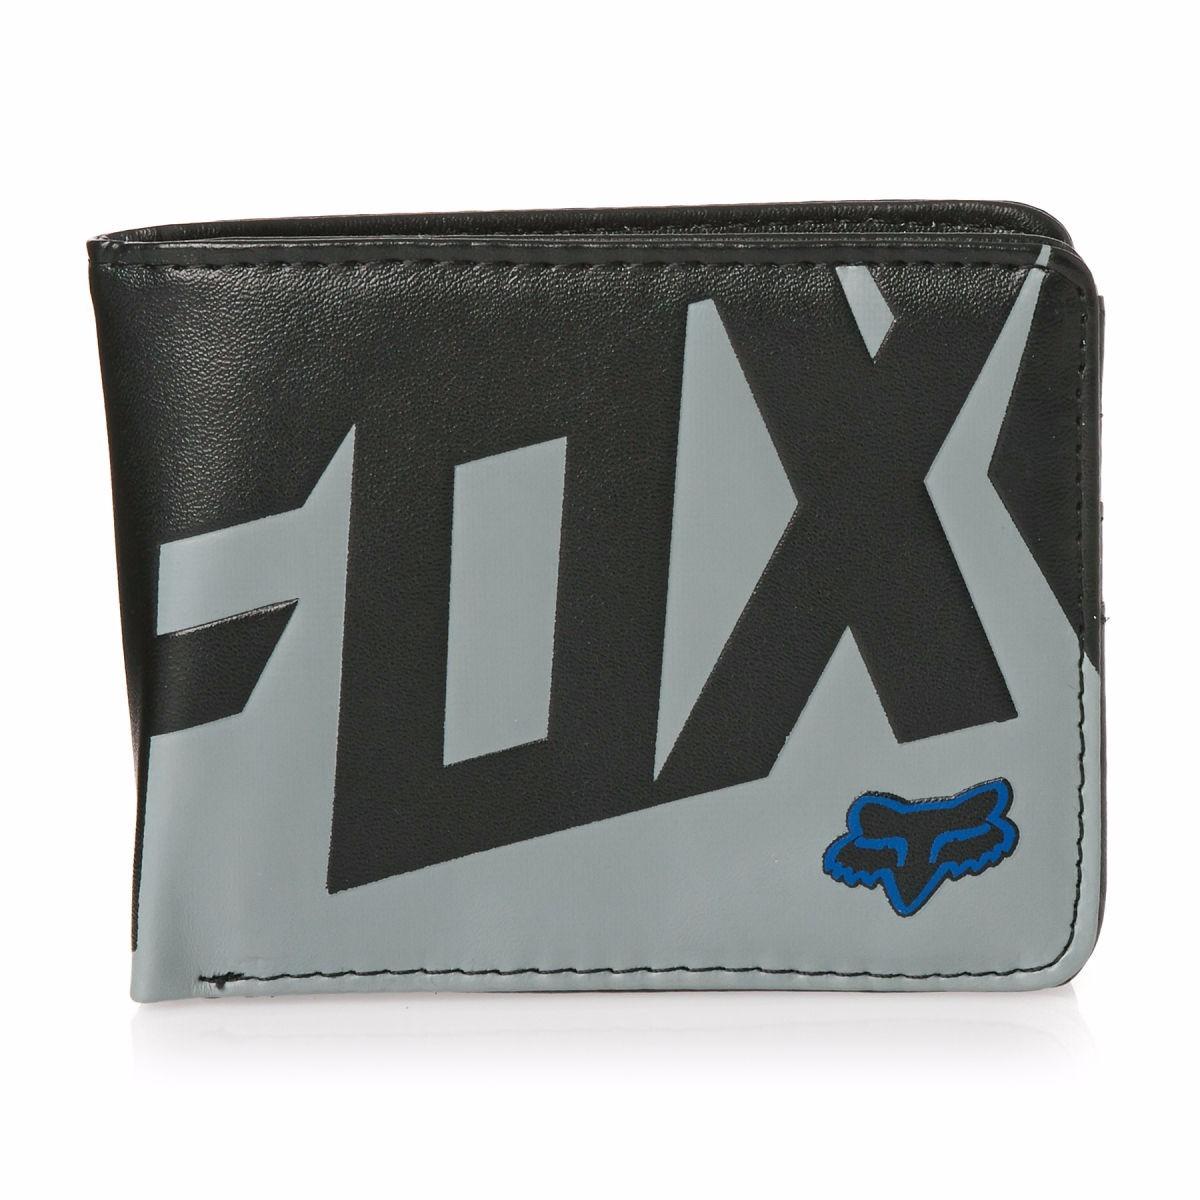 billetera fox projector wallet - intl only negra